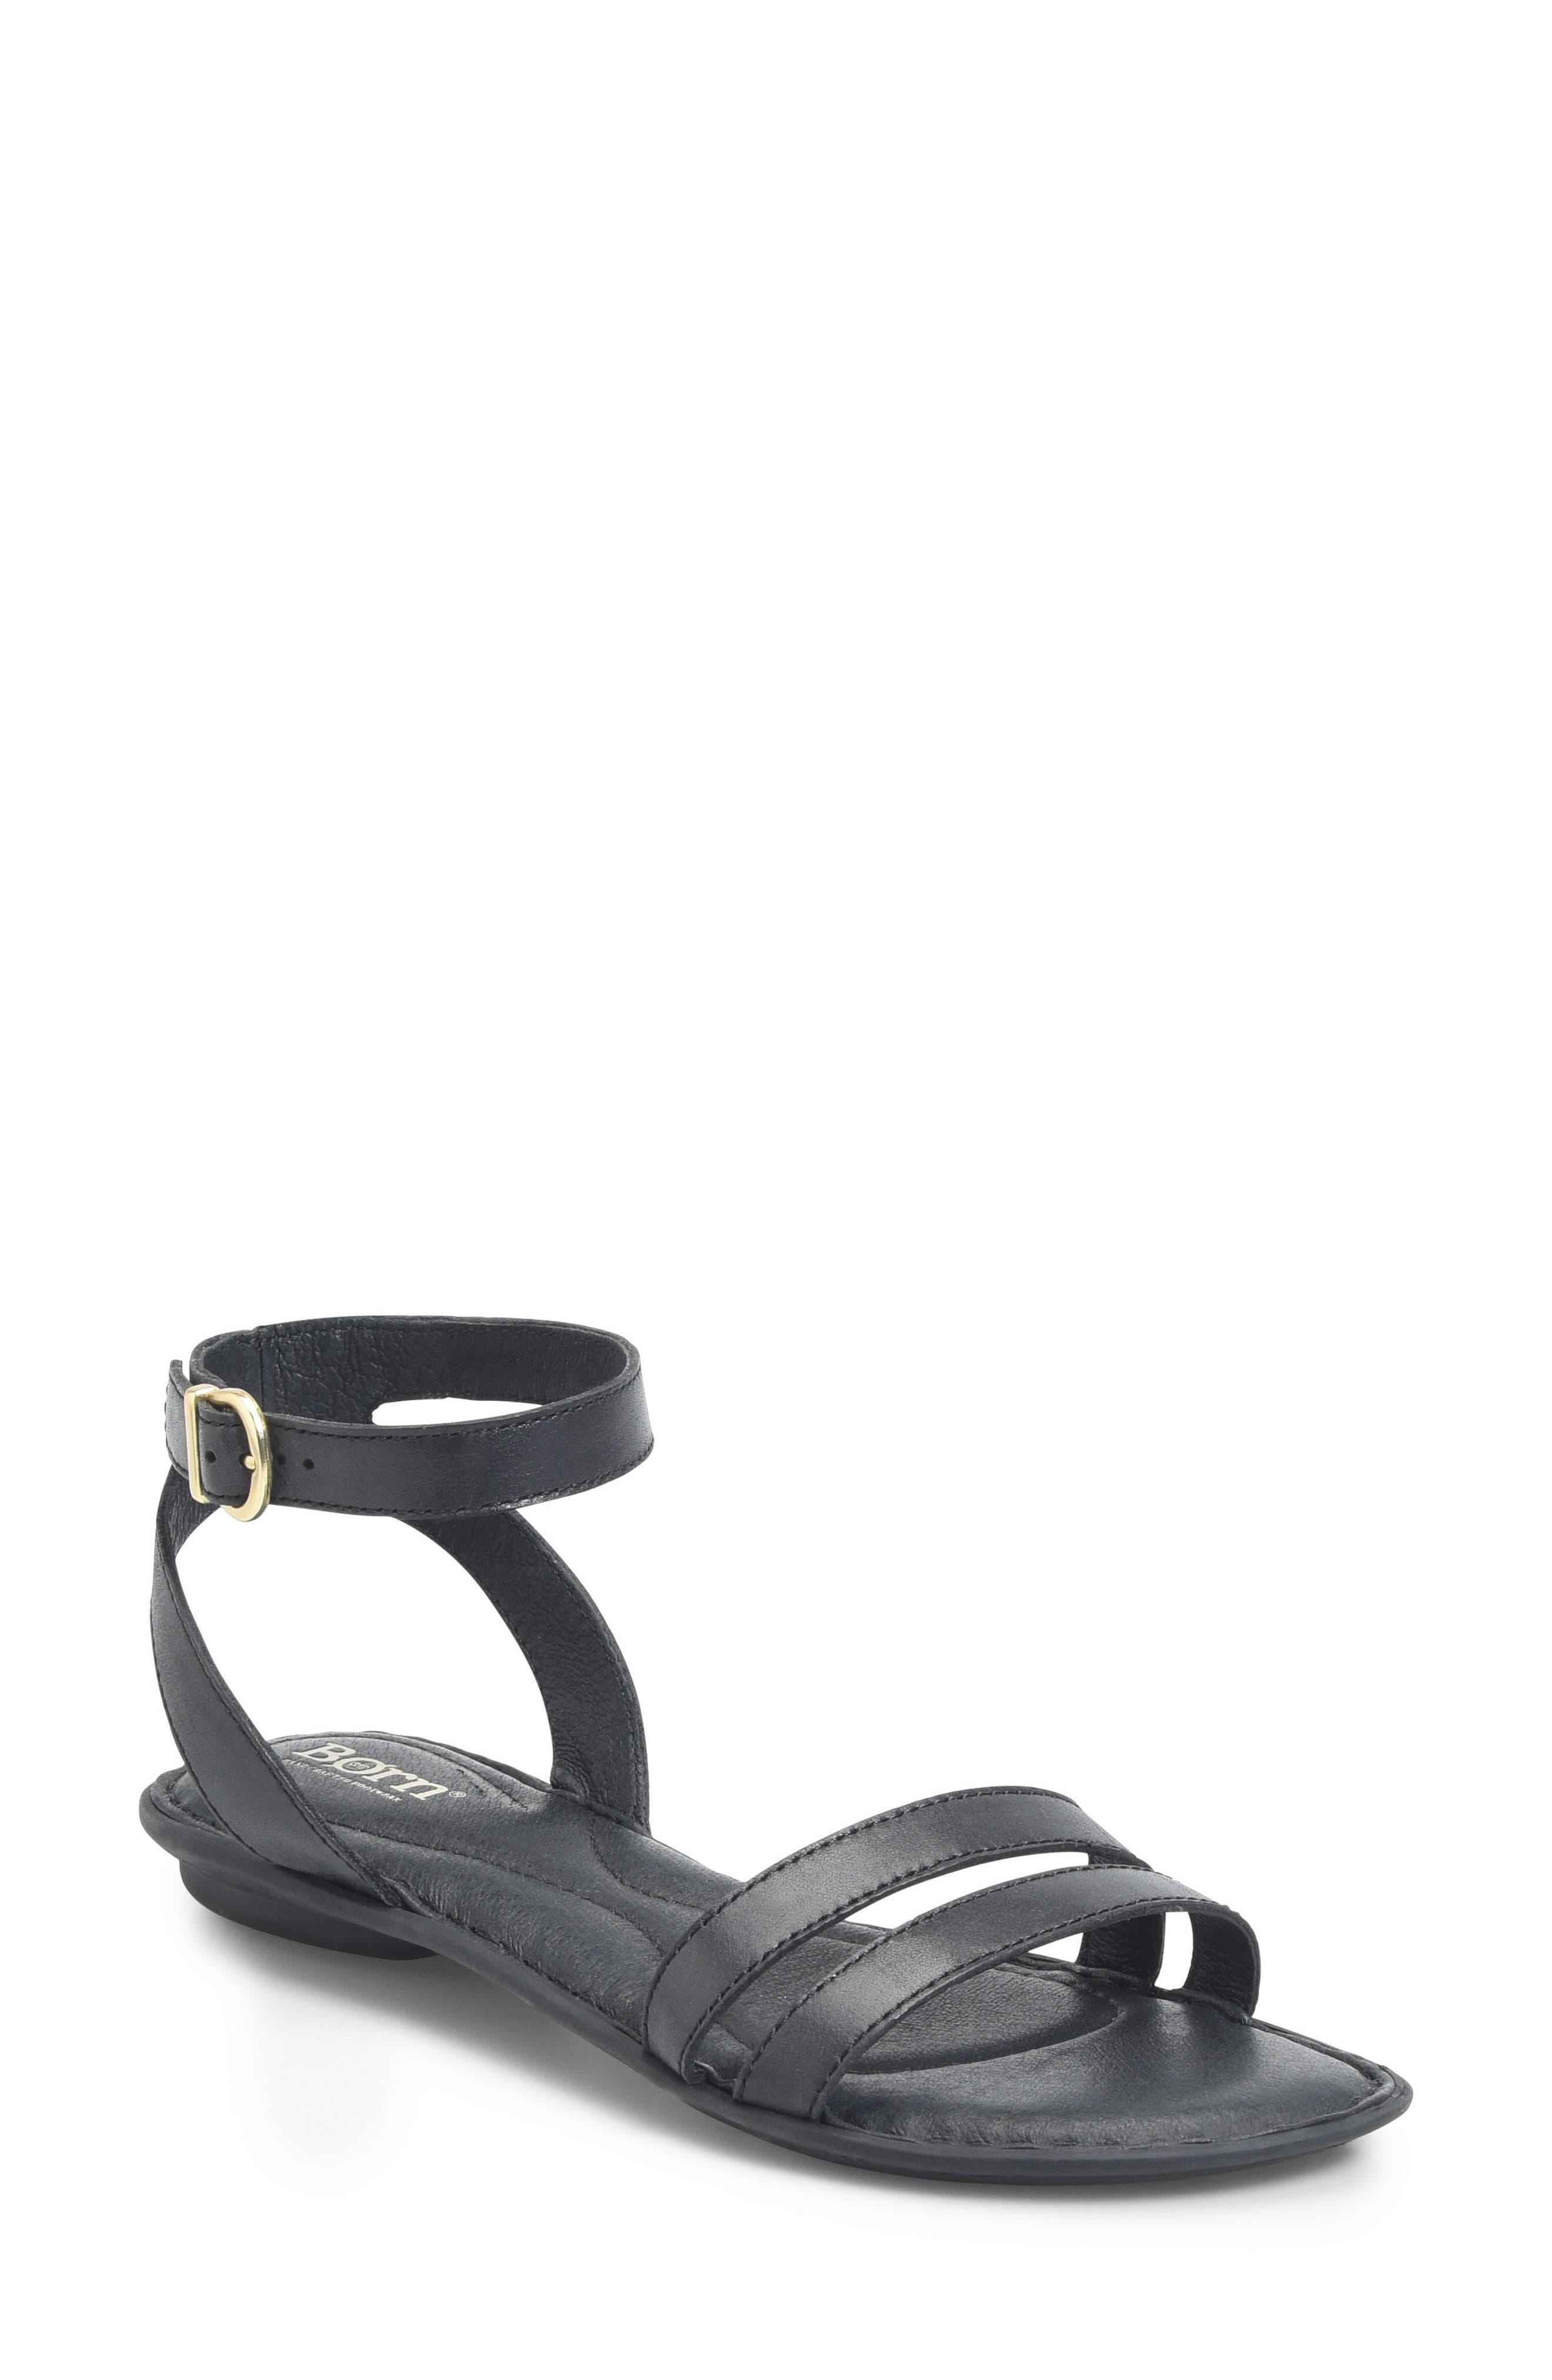 Mai Easy Sandal,                             Main thumbnail 1, color,                             Black Leather